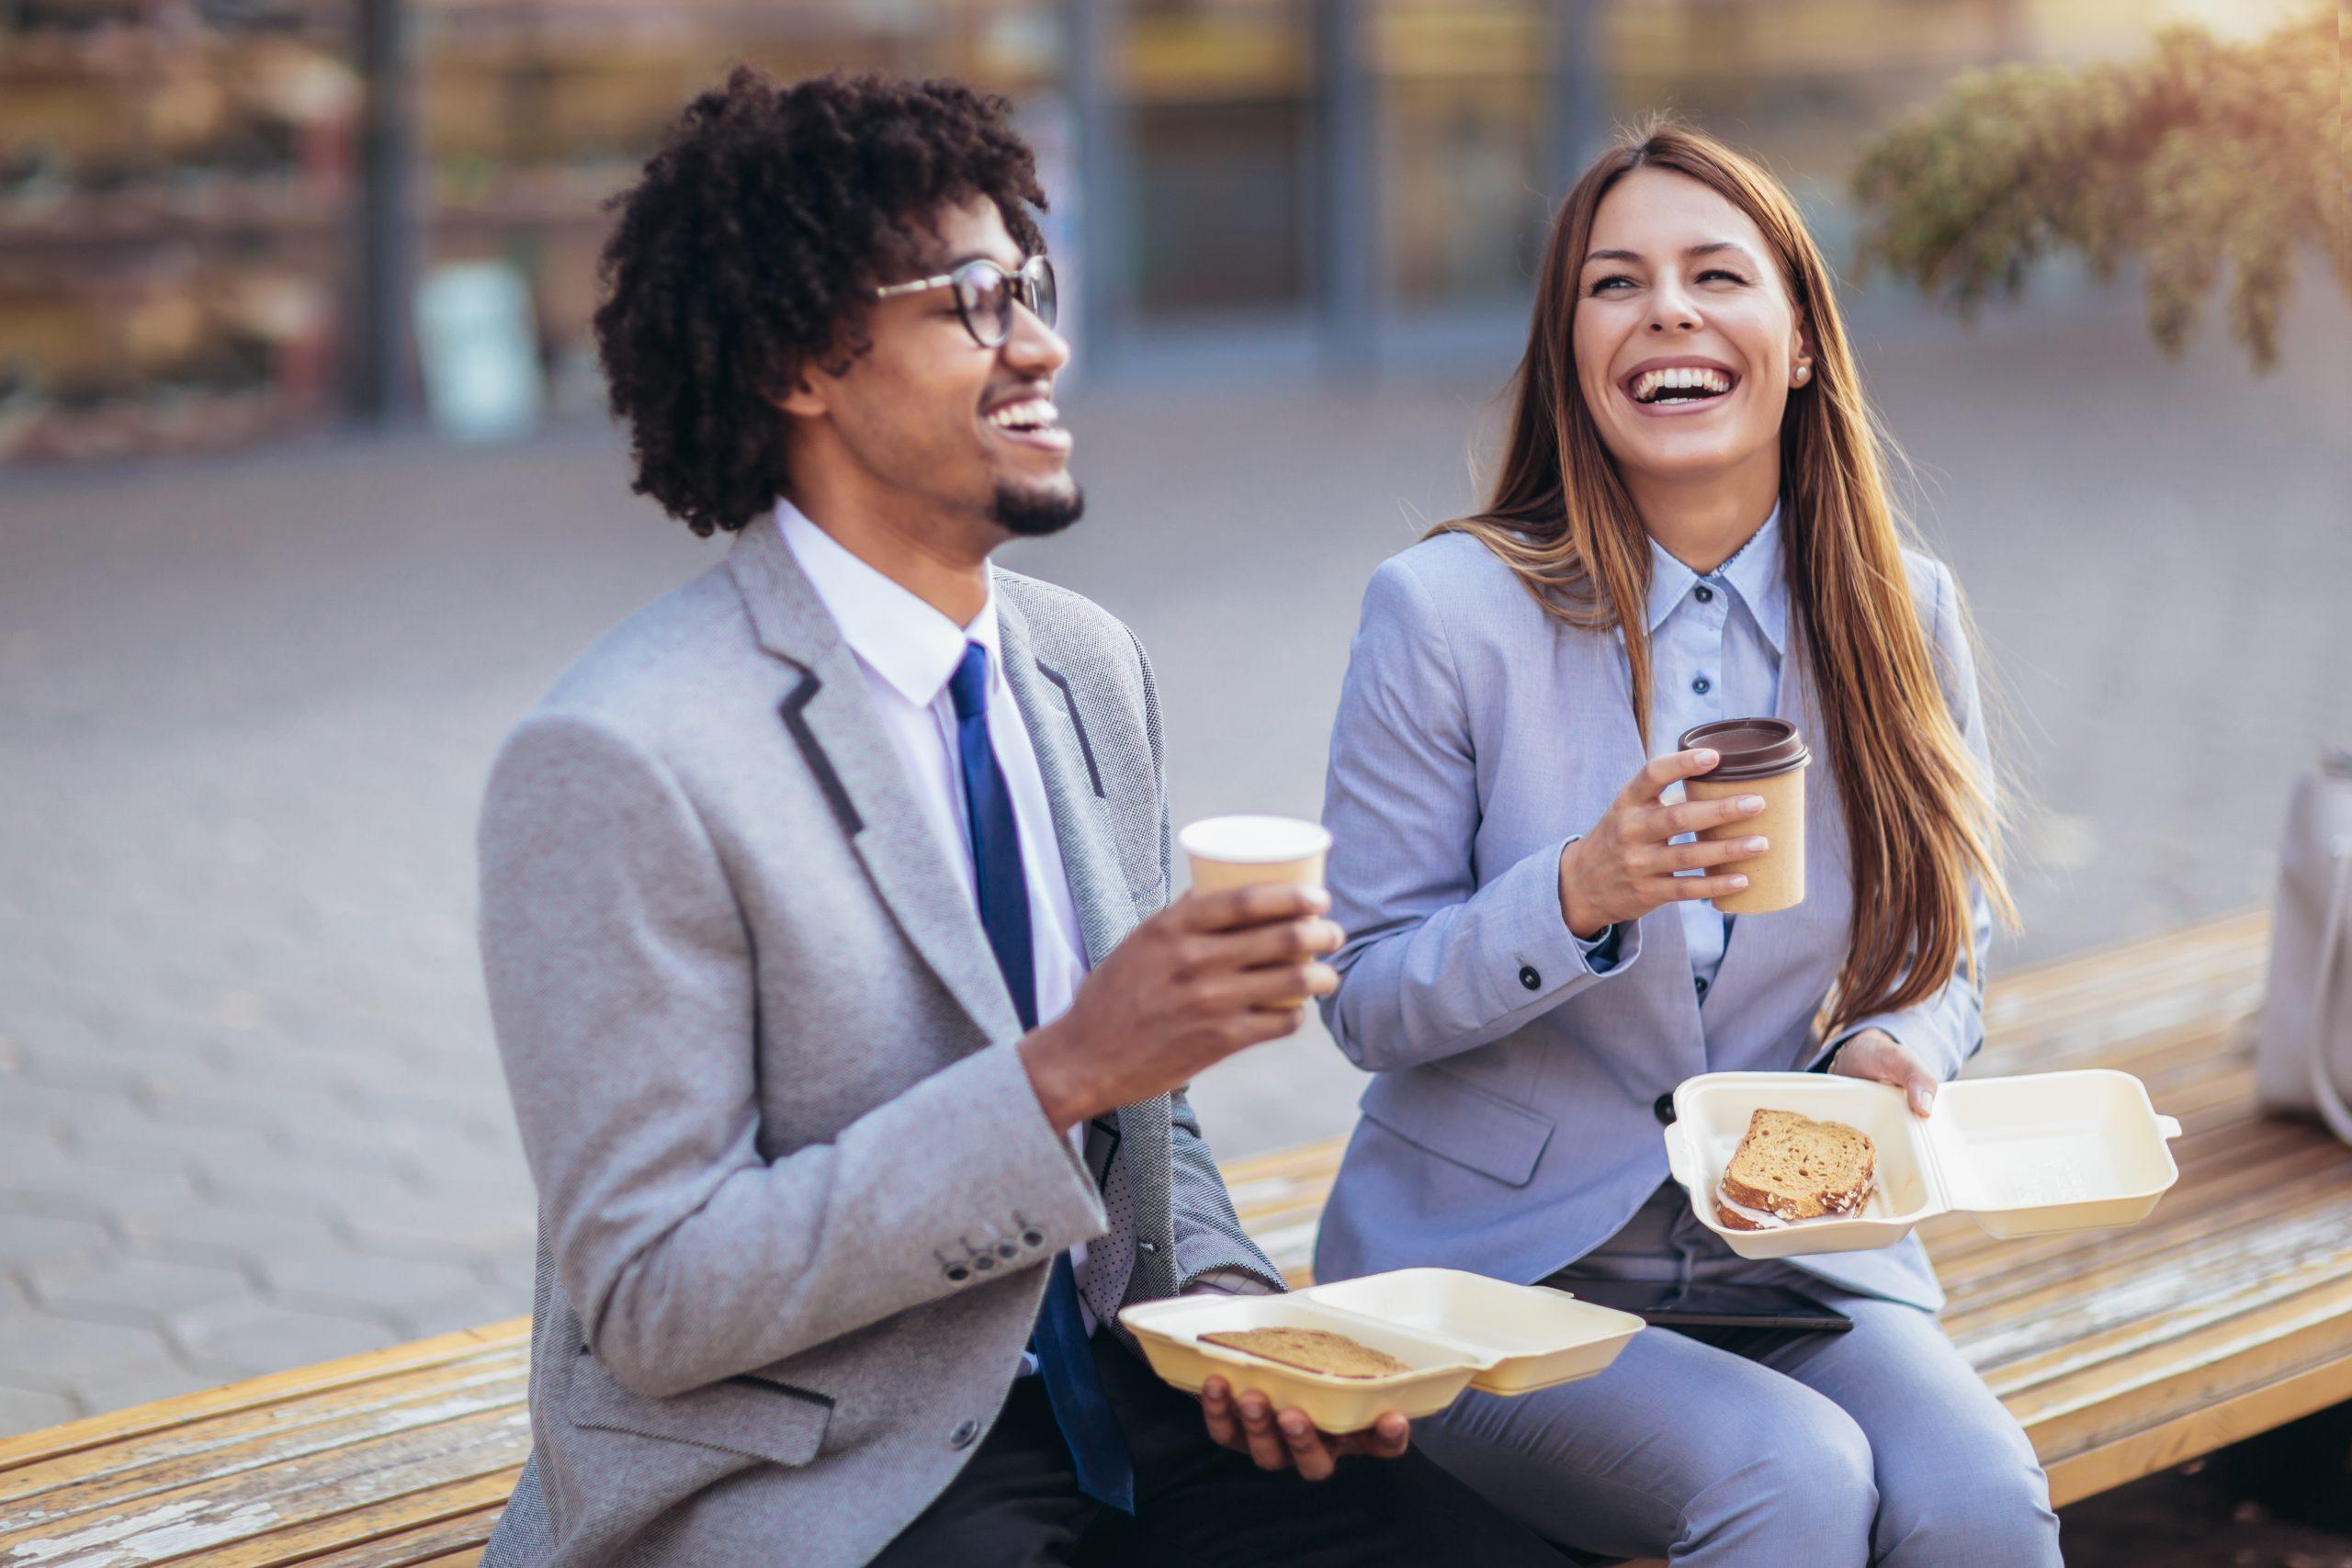 Philadelphia Break Room Solutions | Refreshment Services | Coffee and Tea | Modern Vending Machine